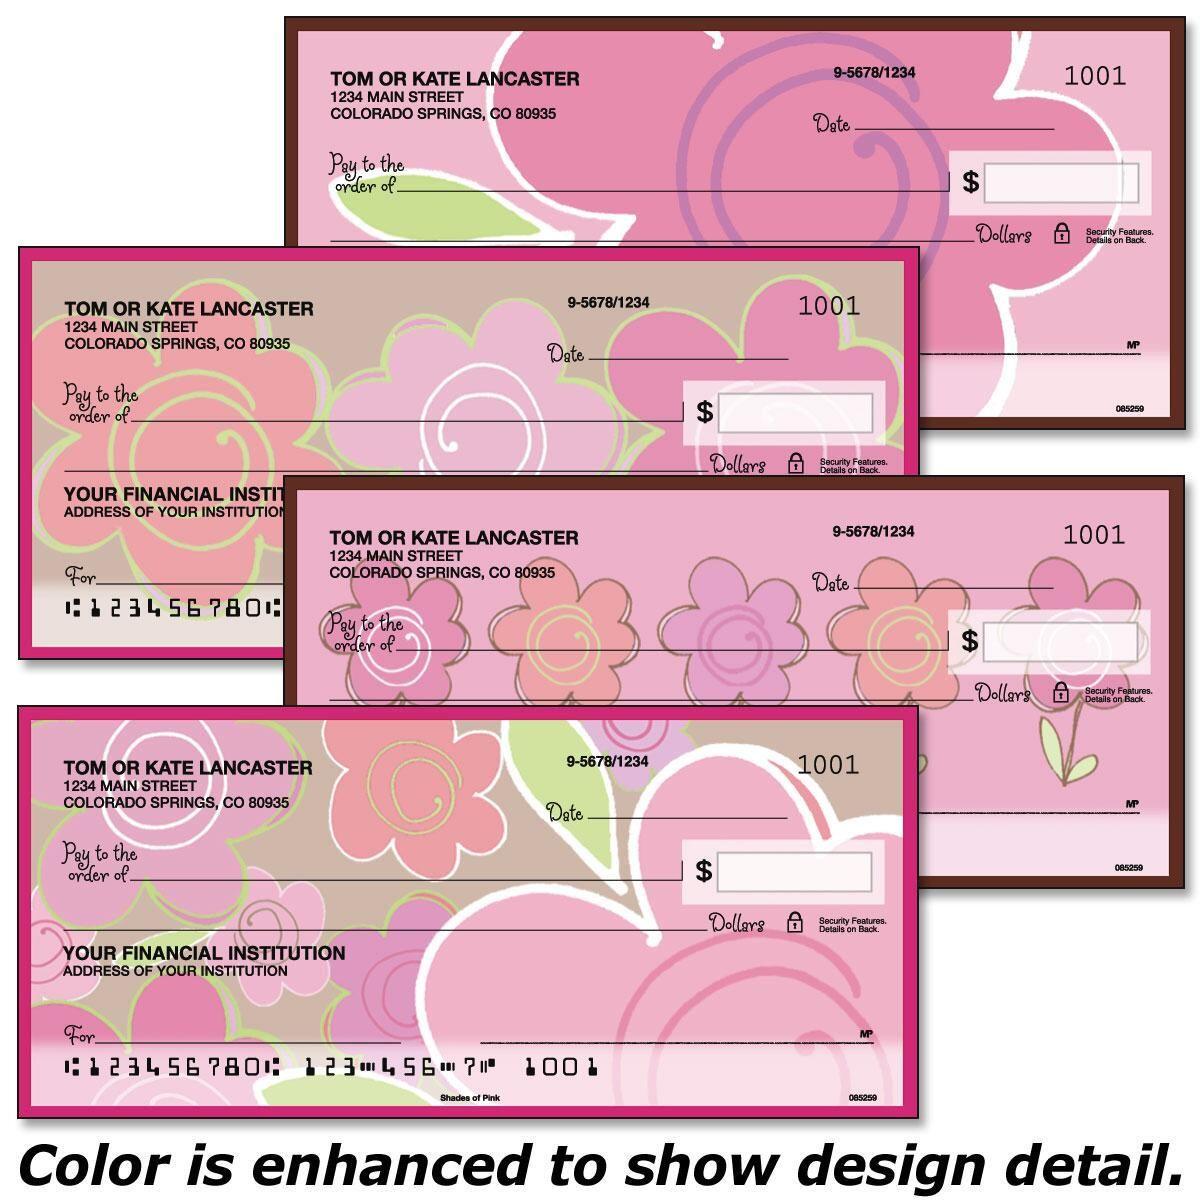 Shades of Pink Duplicate Checks